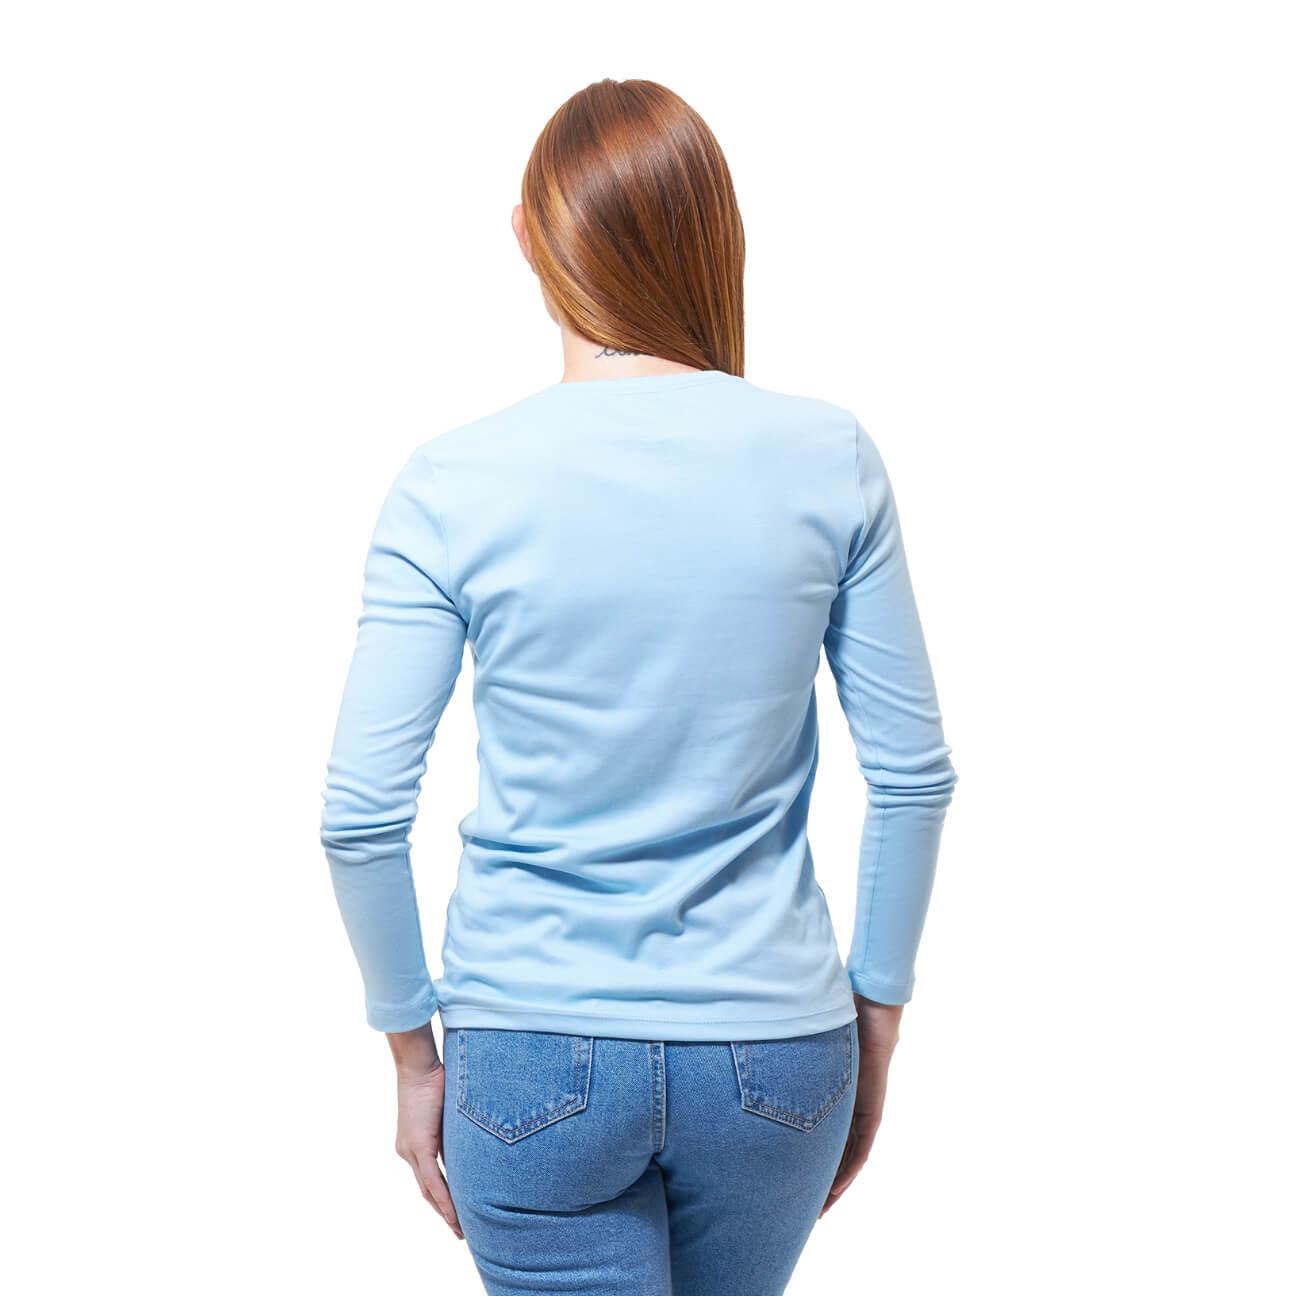 Franela basica dama manga larga azul claro espalda